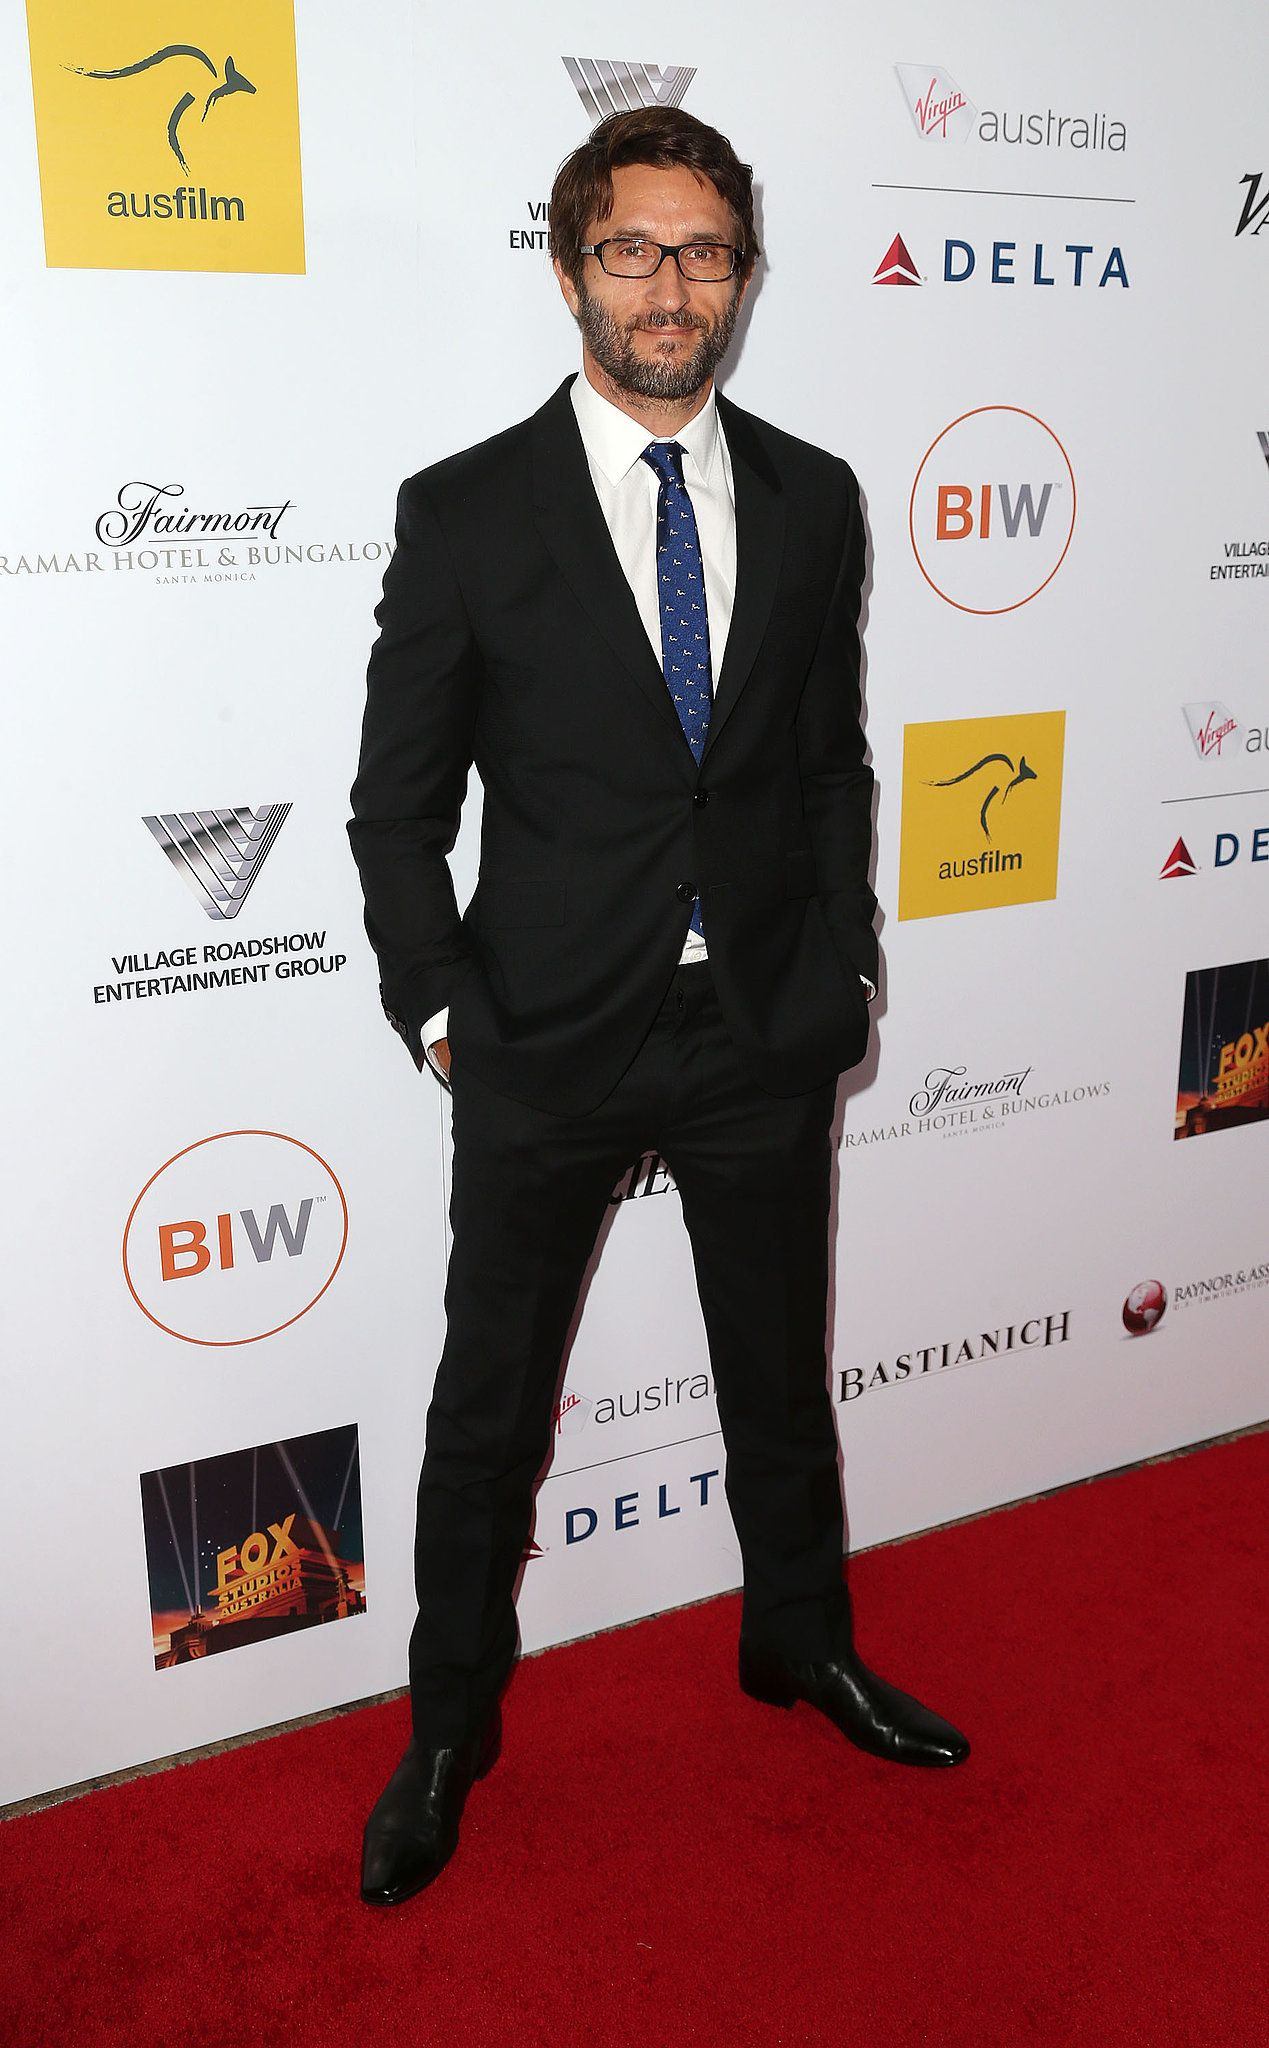 Jonathan LaPaglia at the 2014 Australians in Film gala dinner in LA.